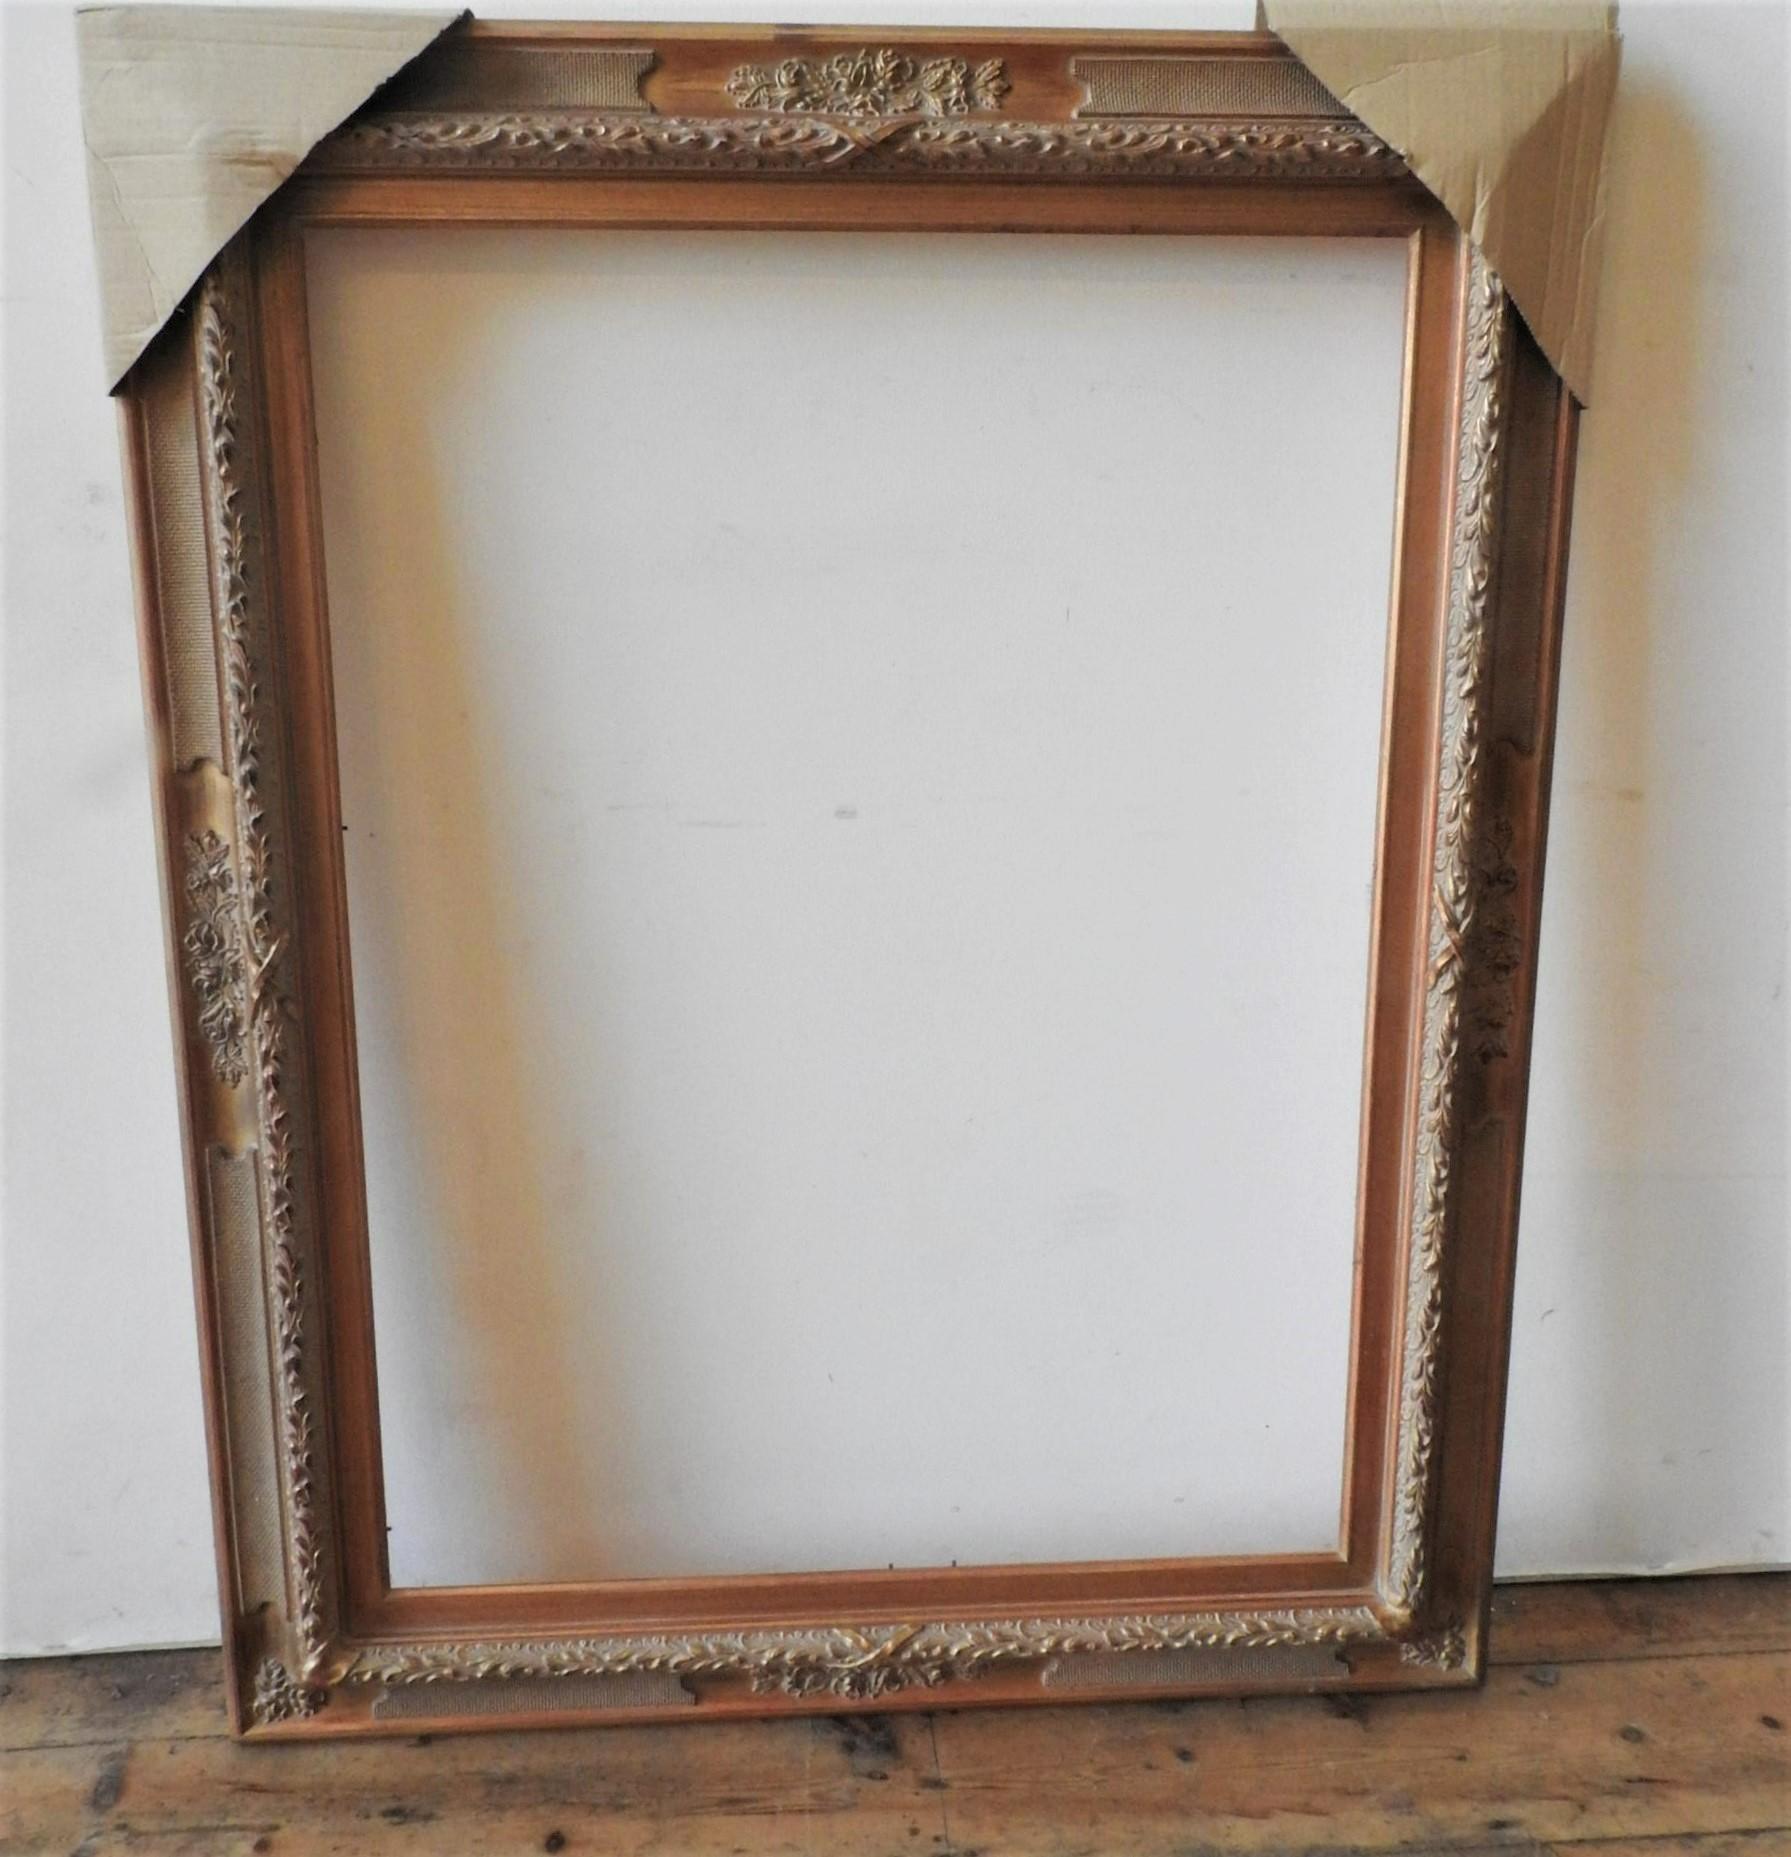 A CONTEMPORARY FOLIATE DECORATED GILT PICTURE FRAME, 129 x 101 cm